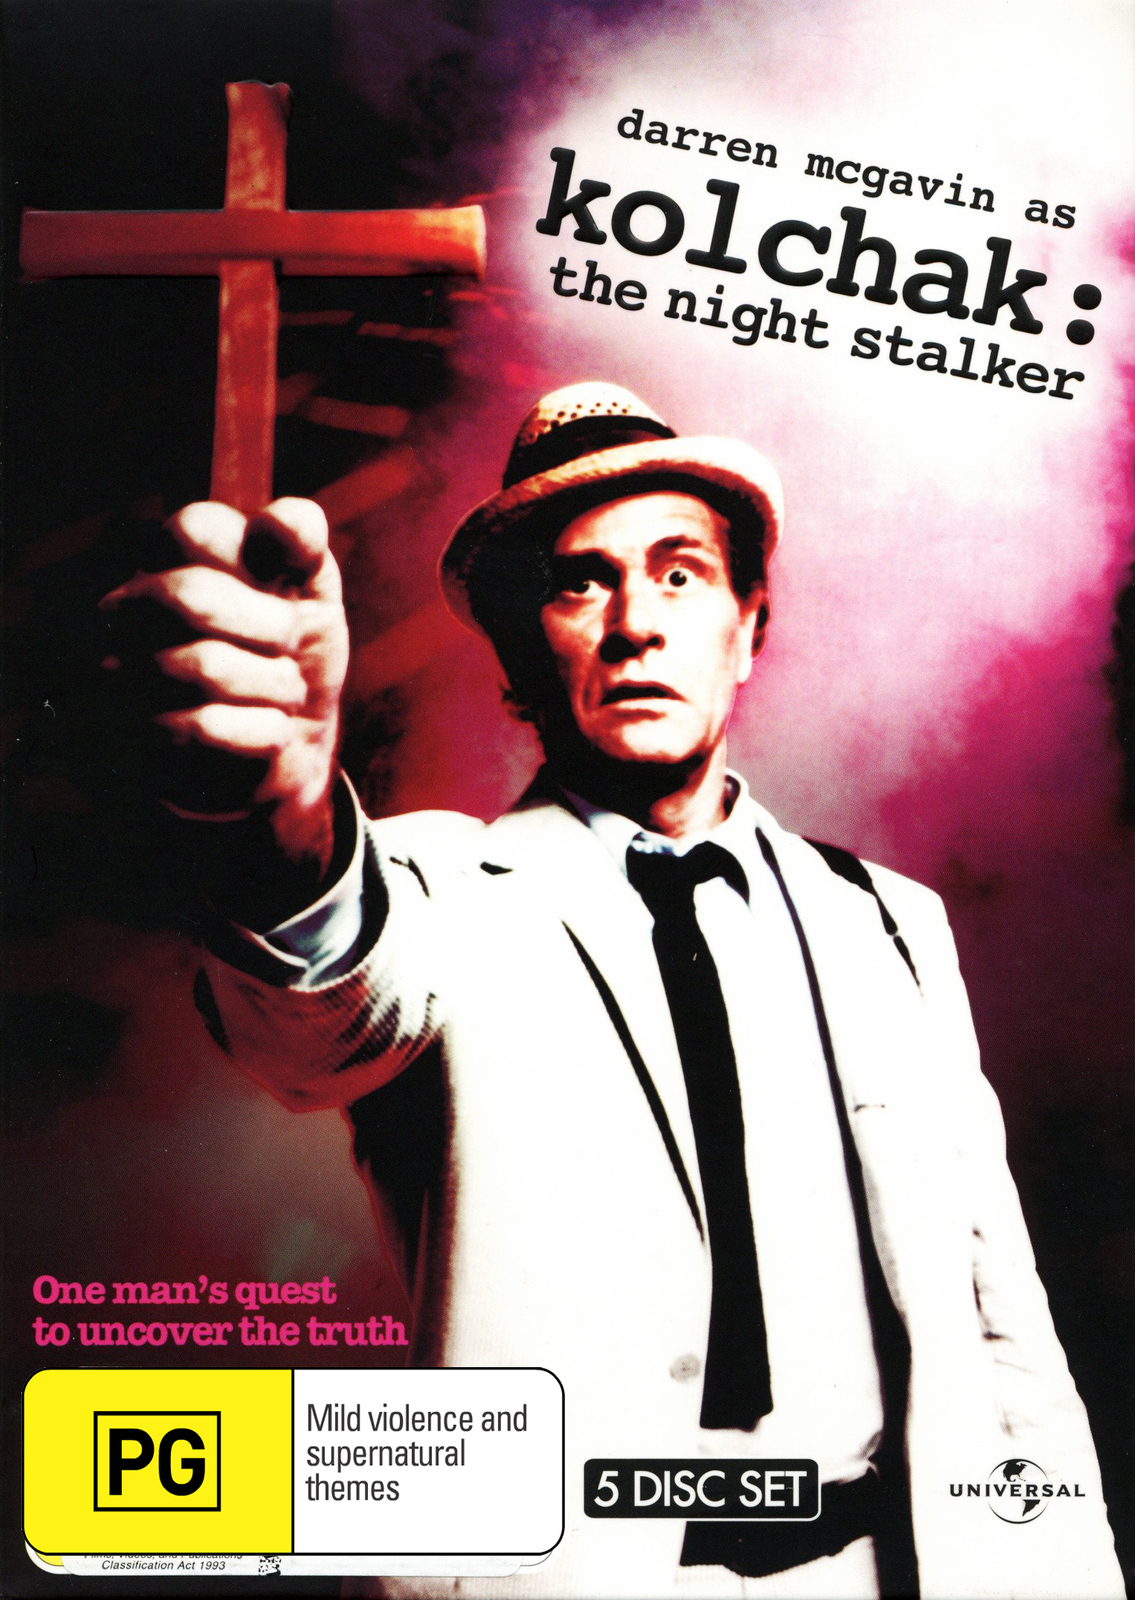 Kolchak: The Night Stalker (5 Disc Set) DVD image